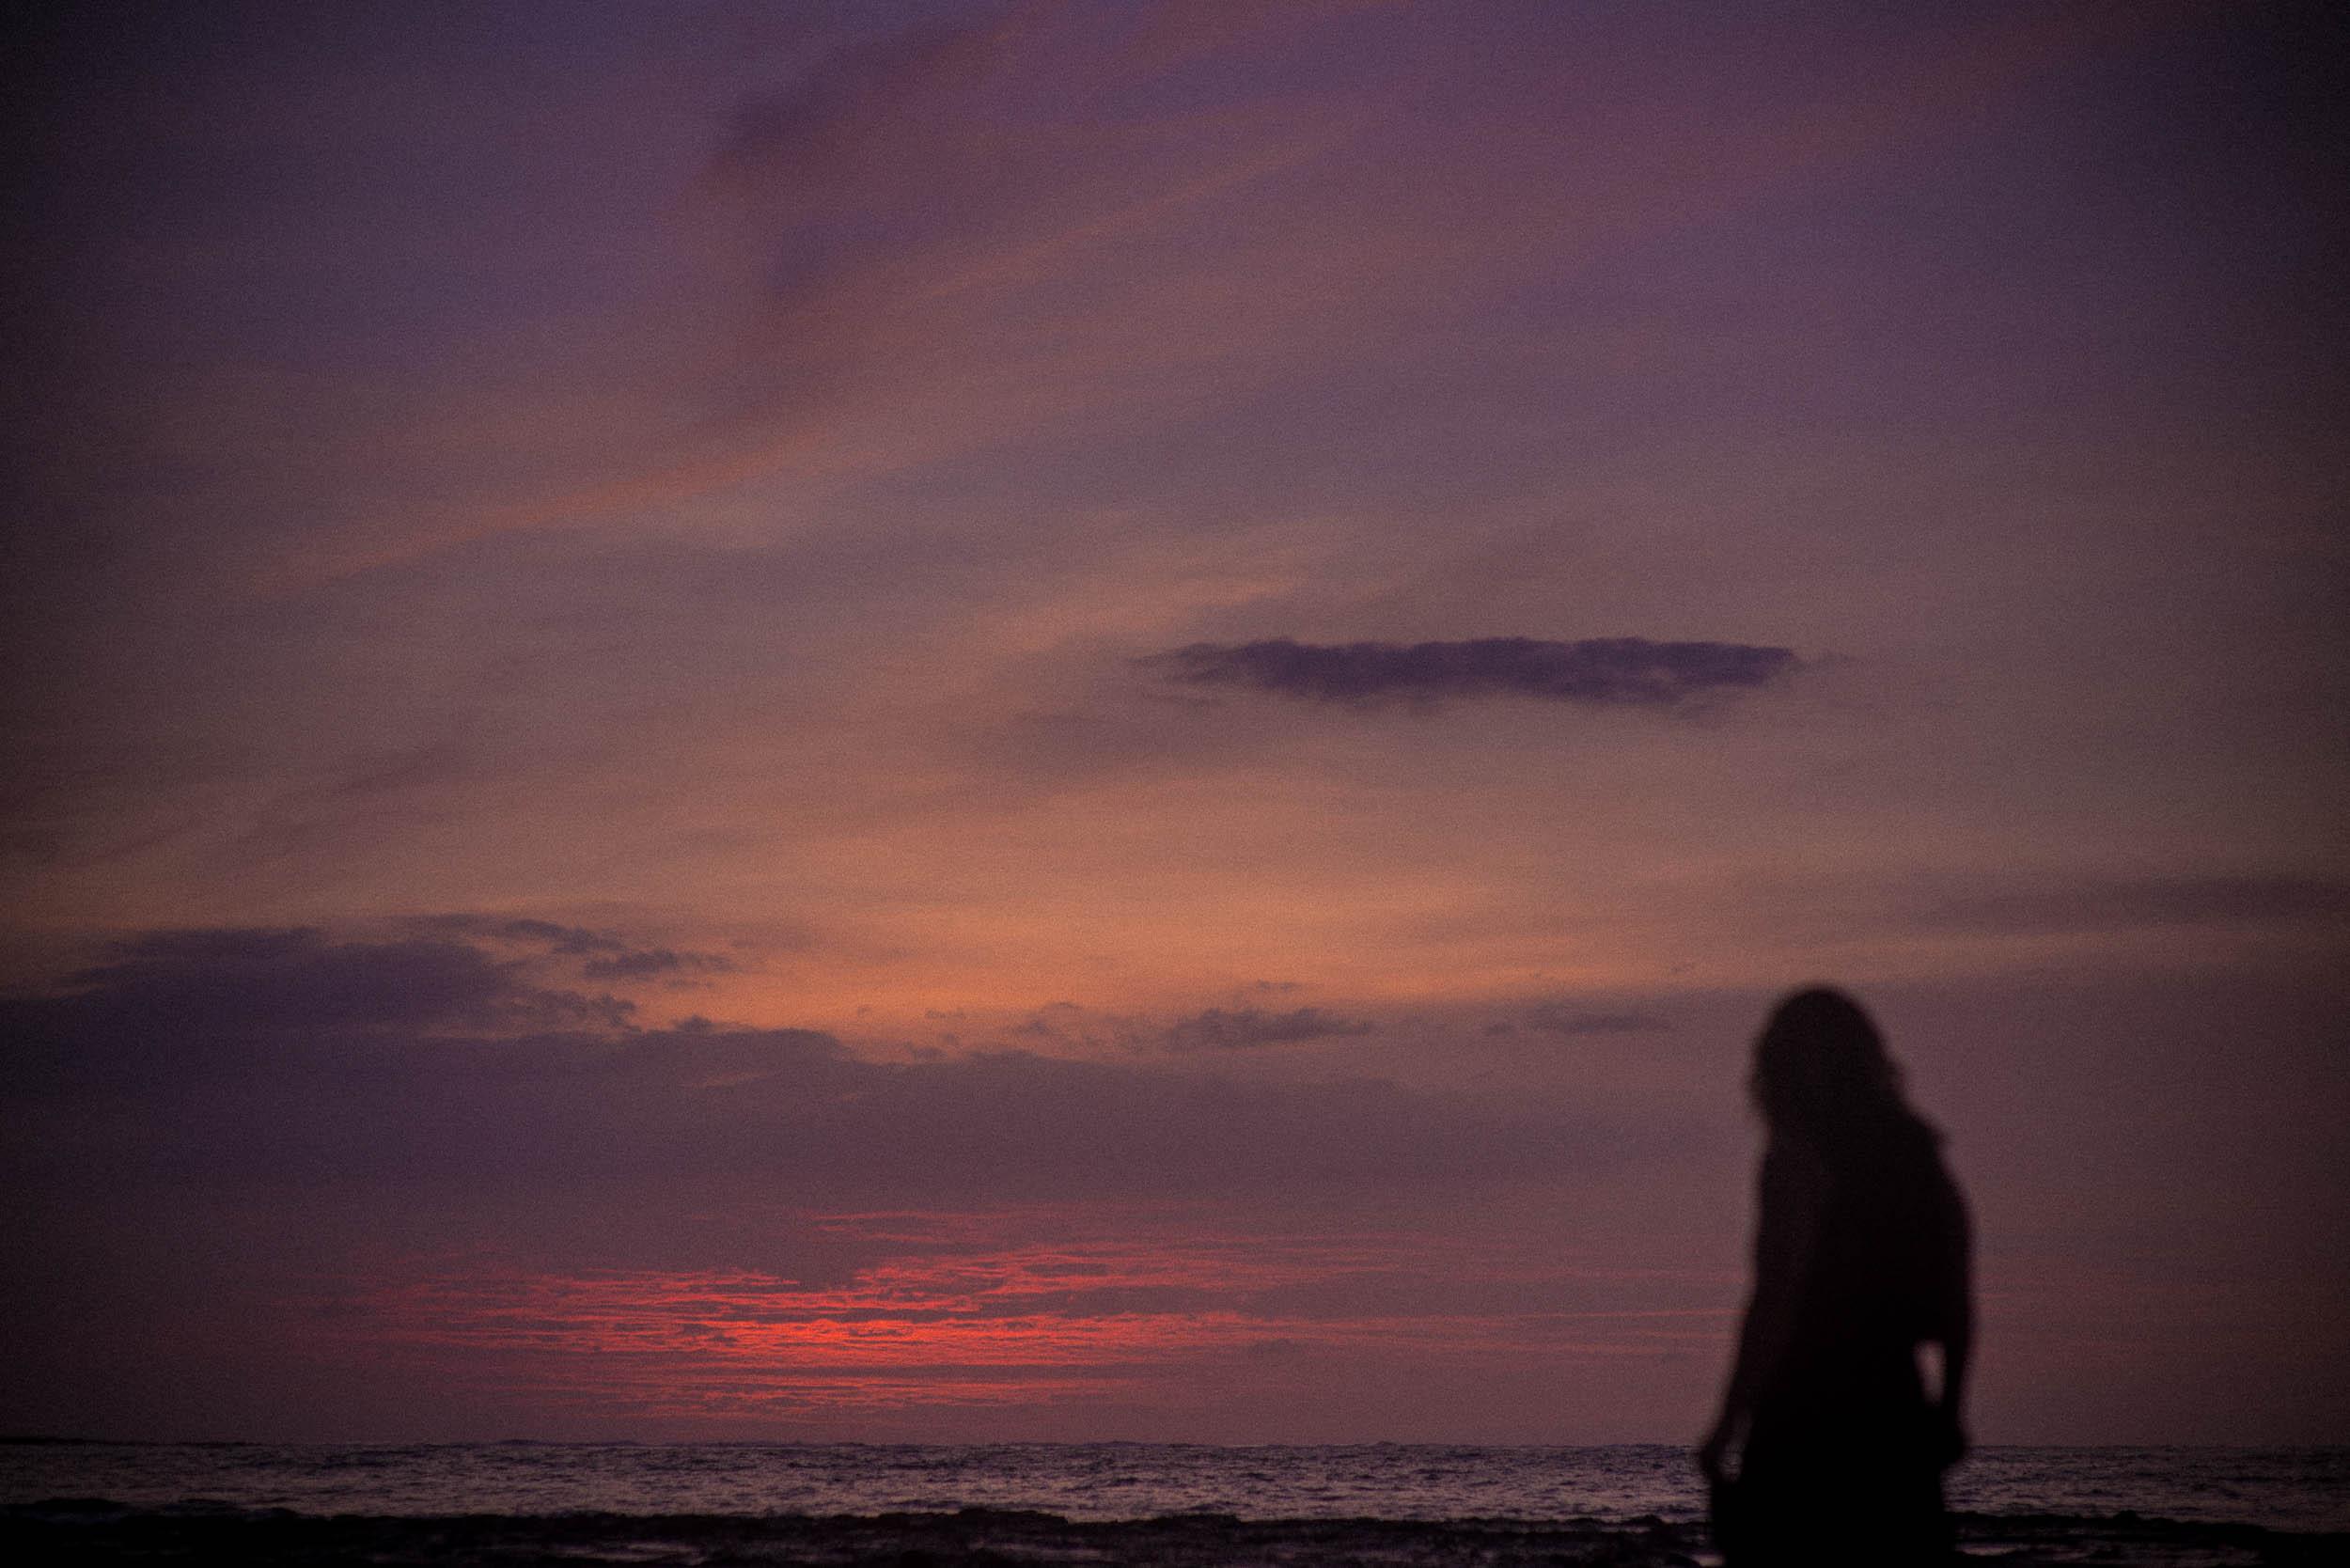 ©PeteLongworth-CostaRica-2018-Selects-06.jpg